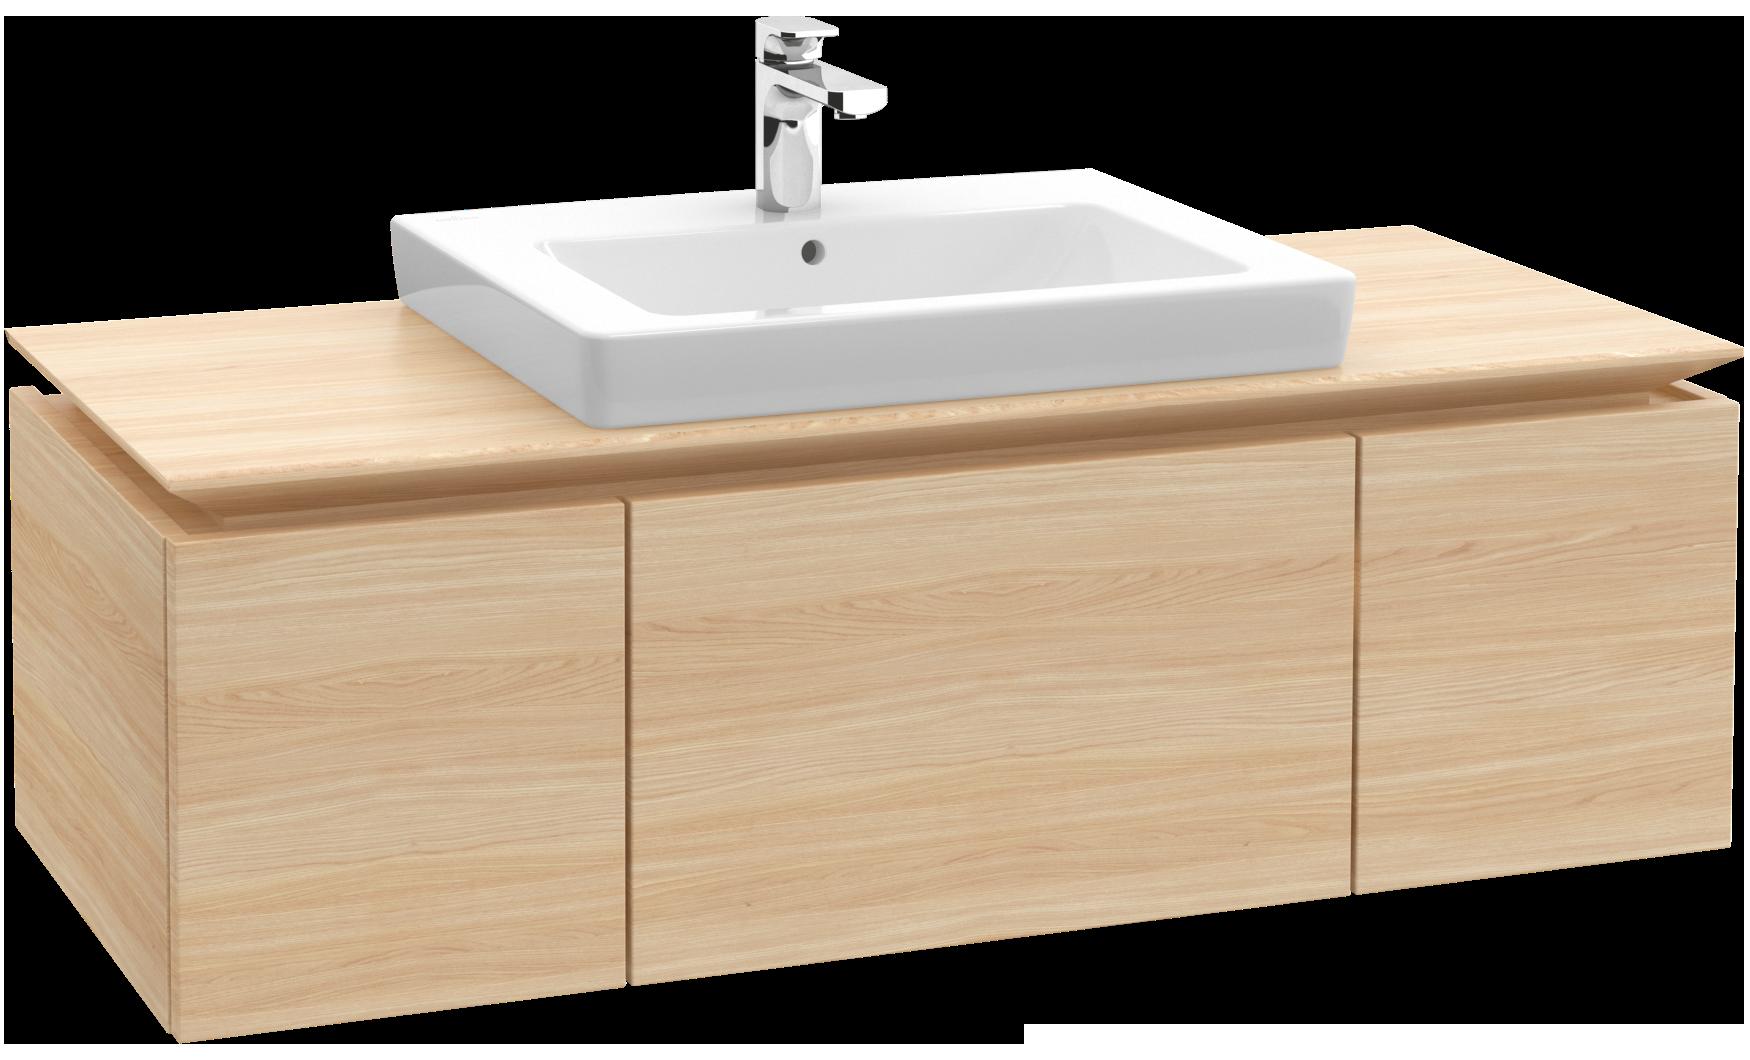 Legato meuble sous lavabo b24900 villeroy boch for Meuble sous lavabo fly